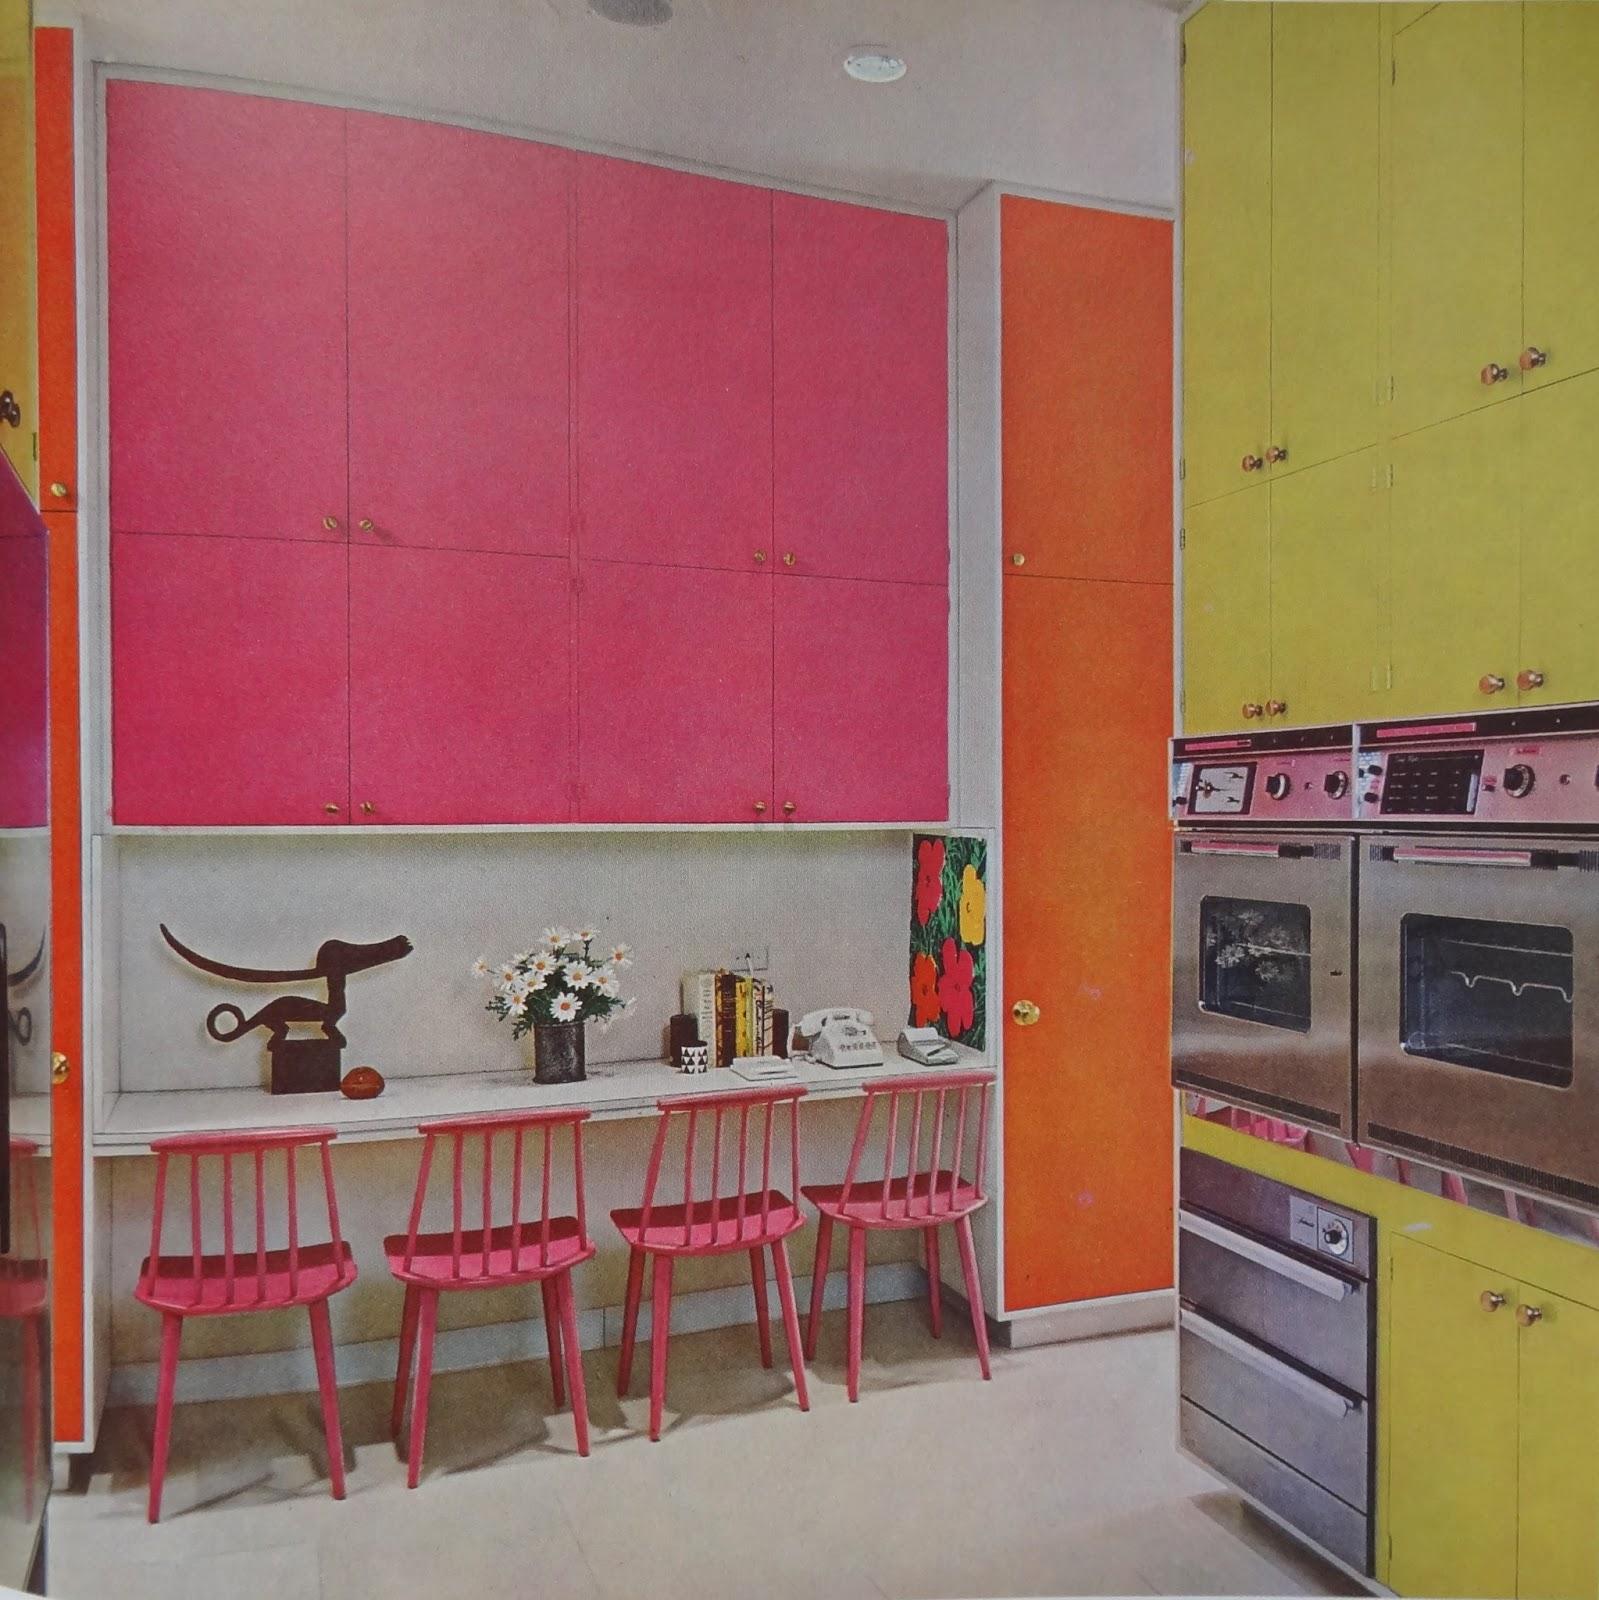 Gypsy yaya june 2013 - Interior design and decoration ...